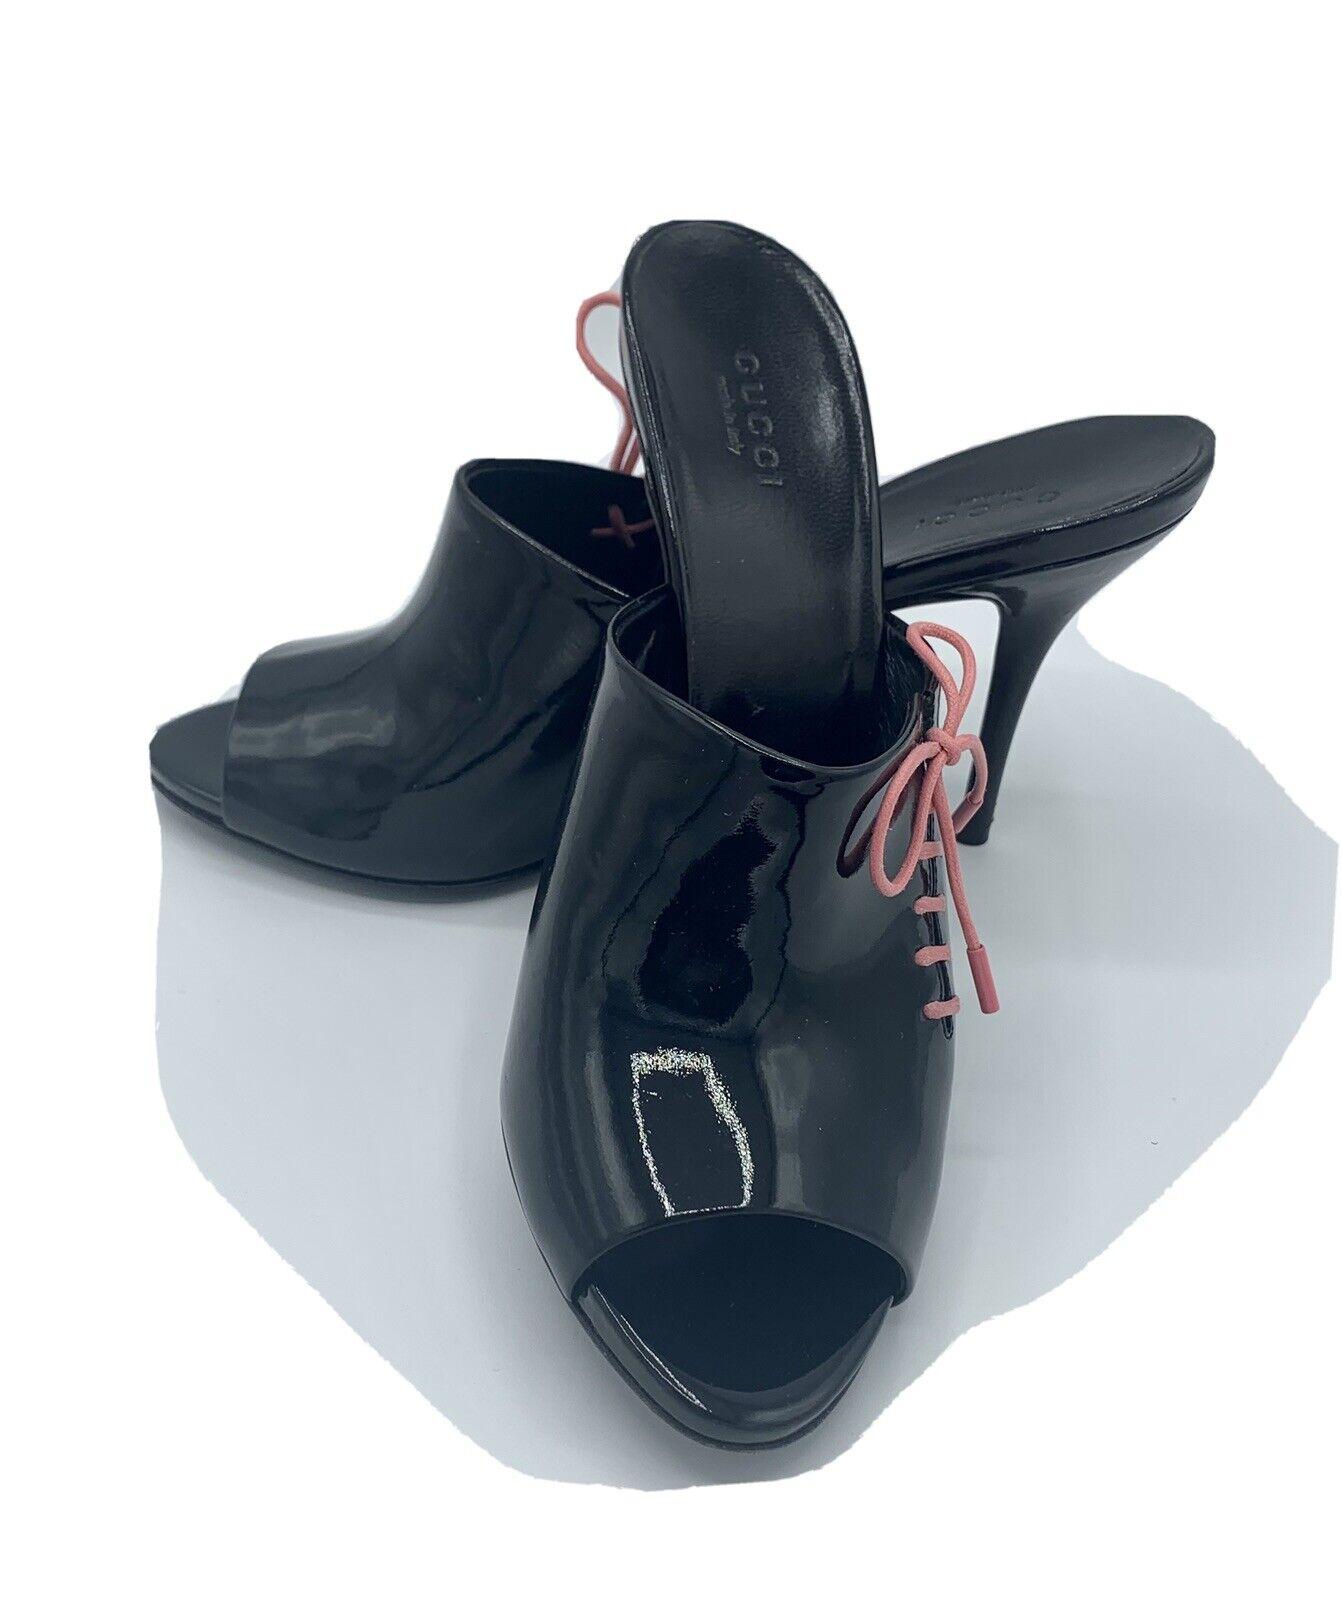 Gucci black Mules - image 1